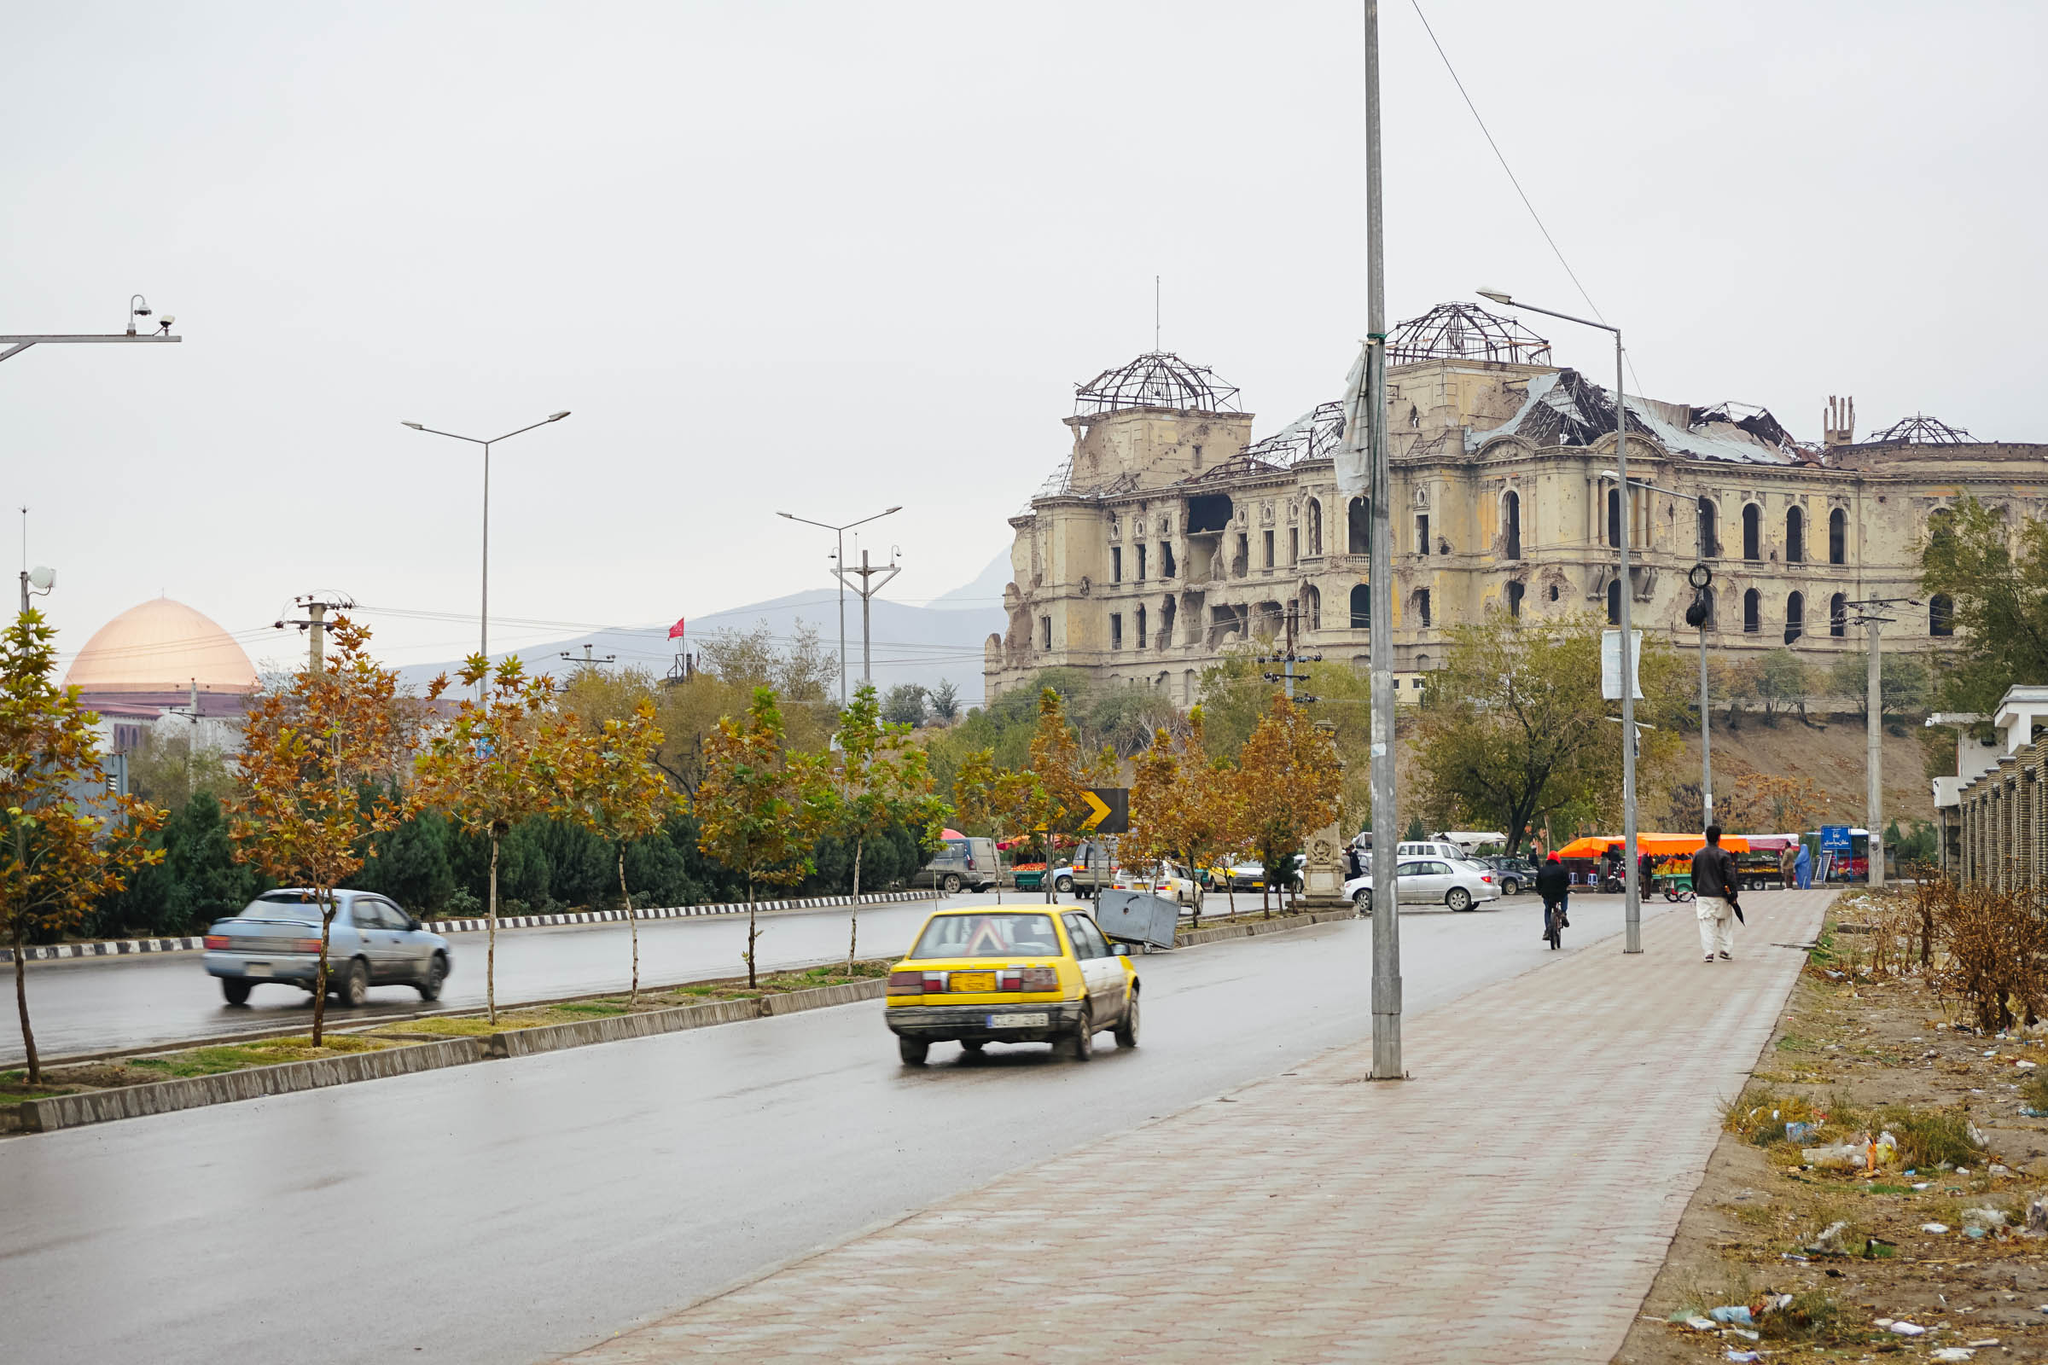 Straße vor dem zerstörten Präsidentenpalast